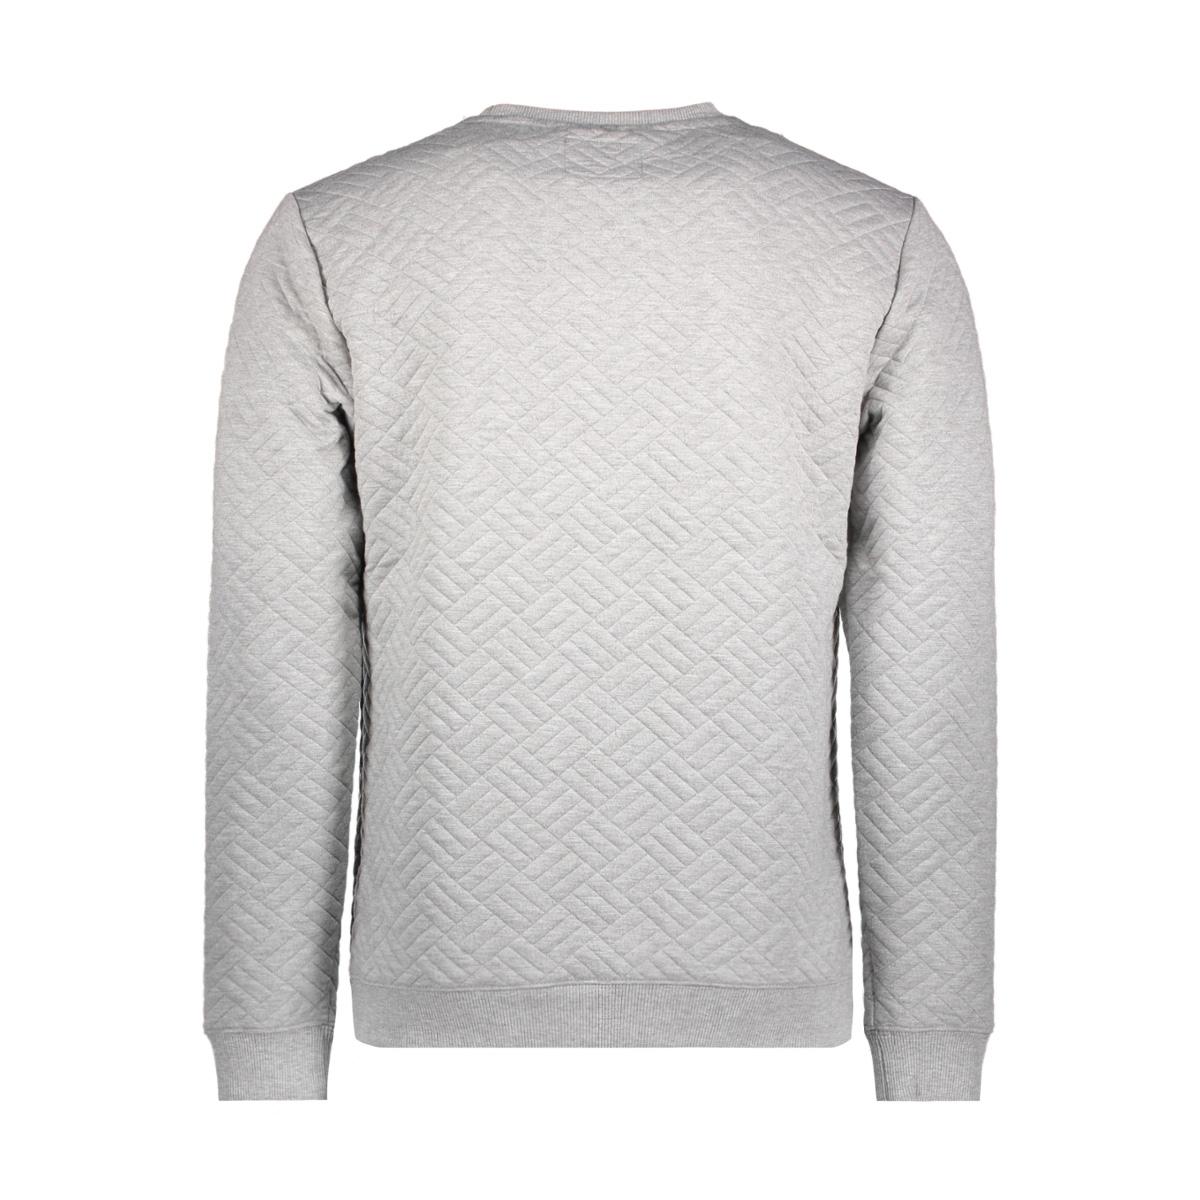 82100708 no-excess sweater 102 grey melange